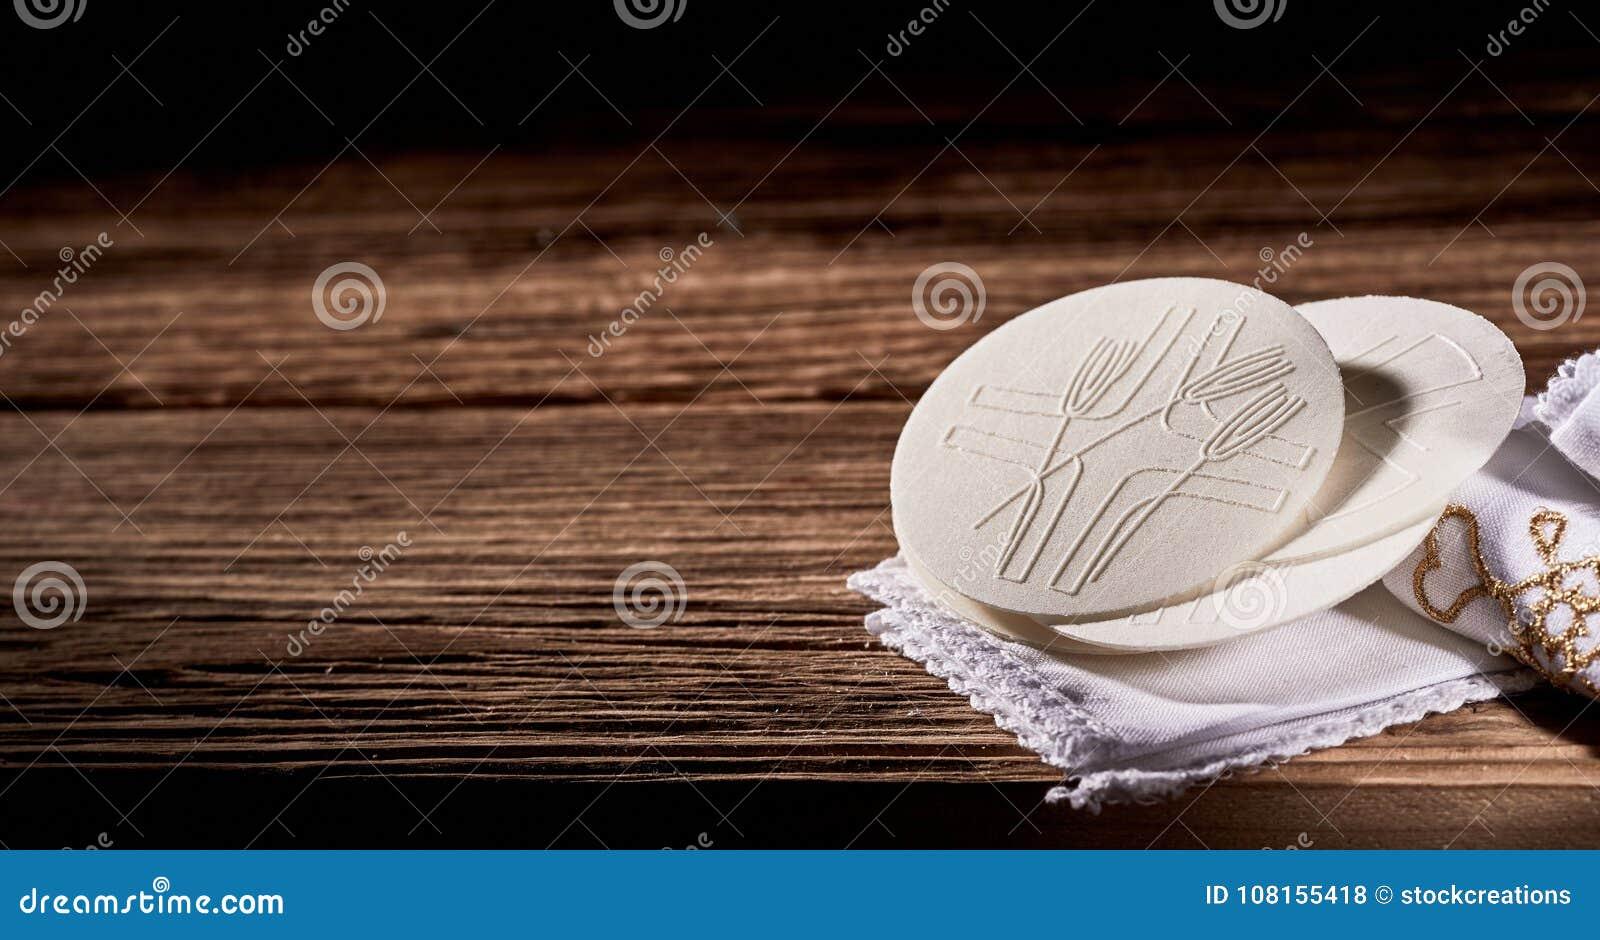 Insegna rustica con Hosties o pane sacramentale